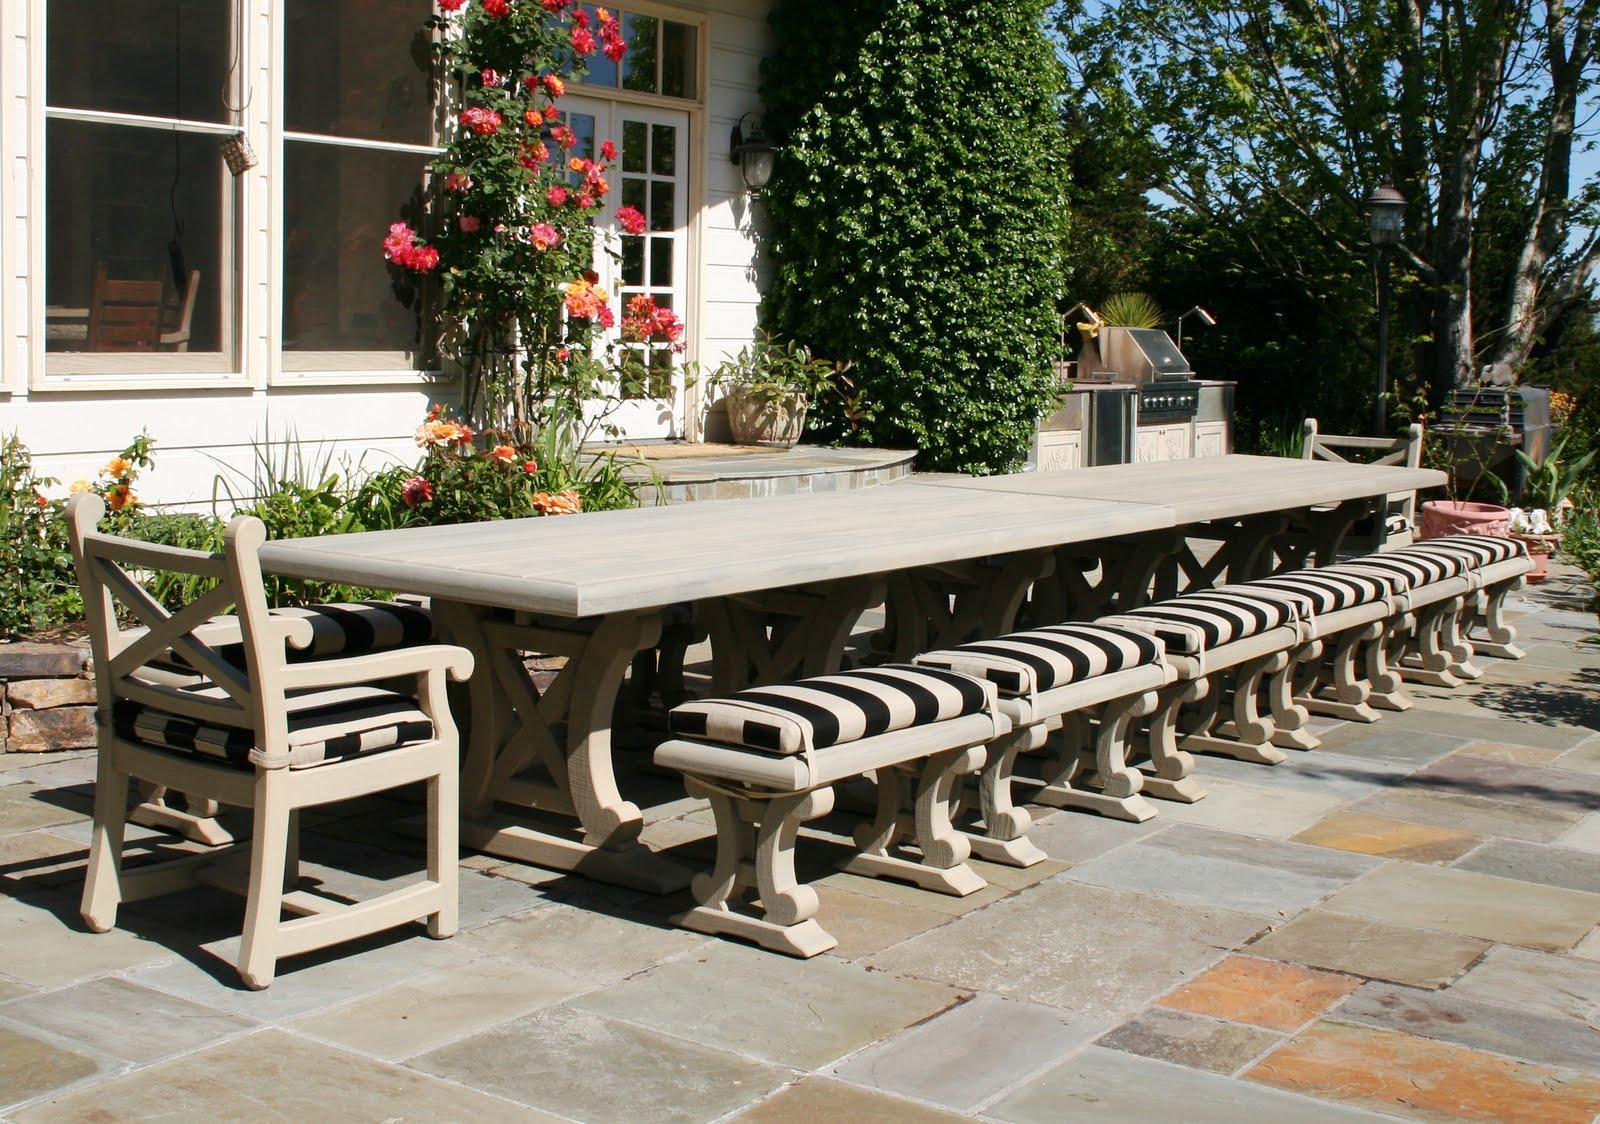 Walters NYC Blog: Reed Bros.: Big Otdoor Tables For Grand